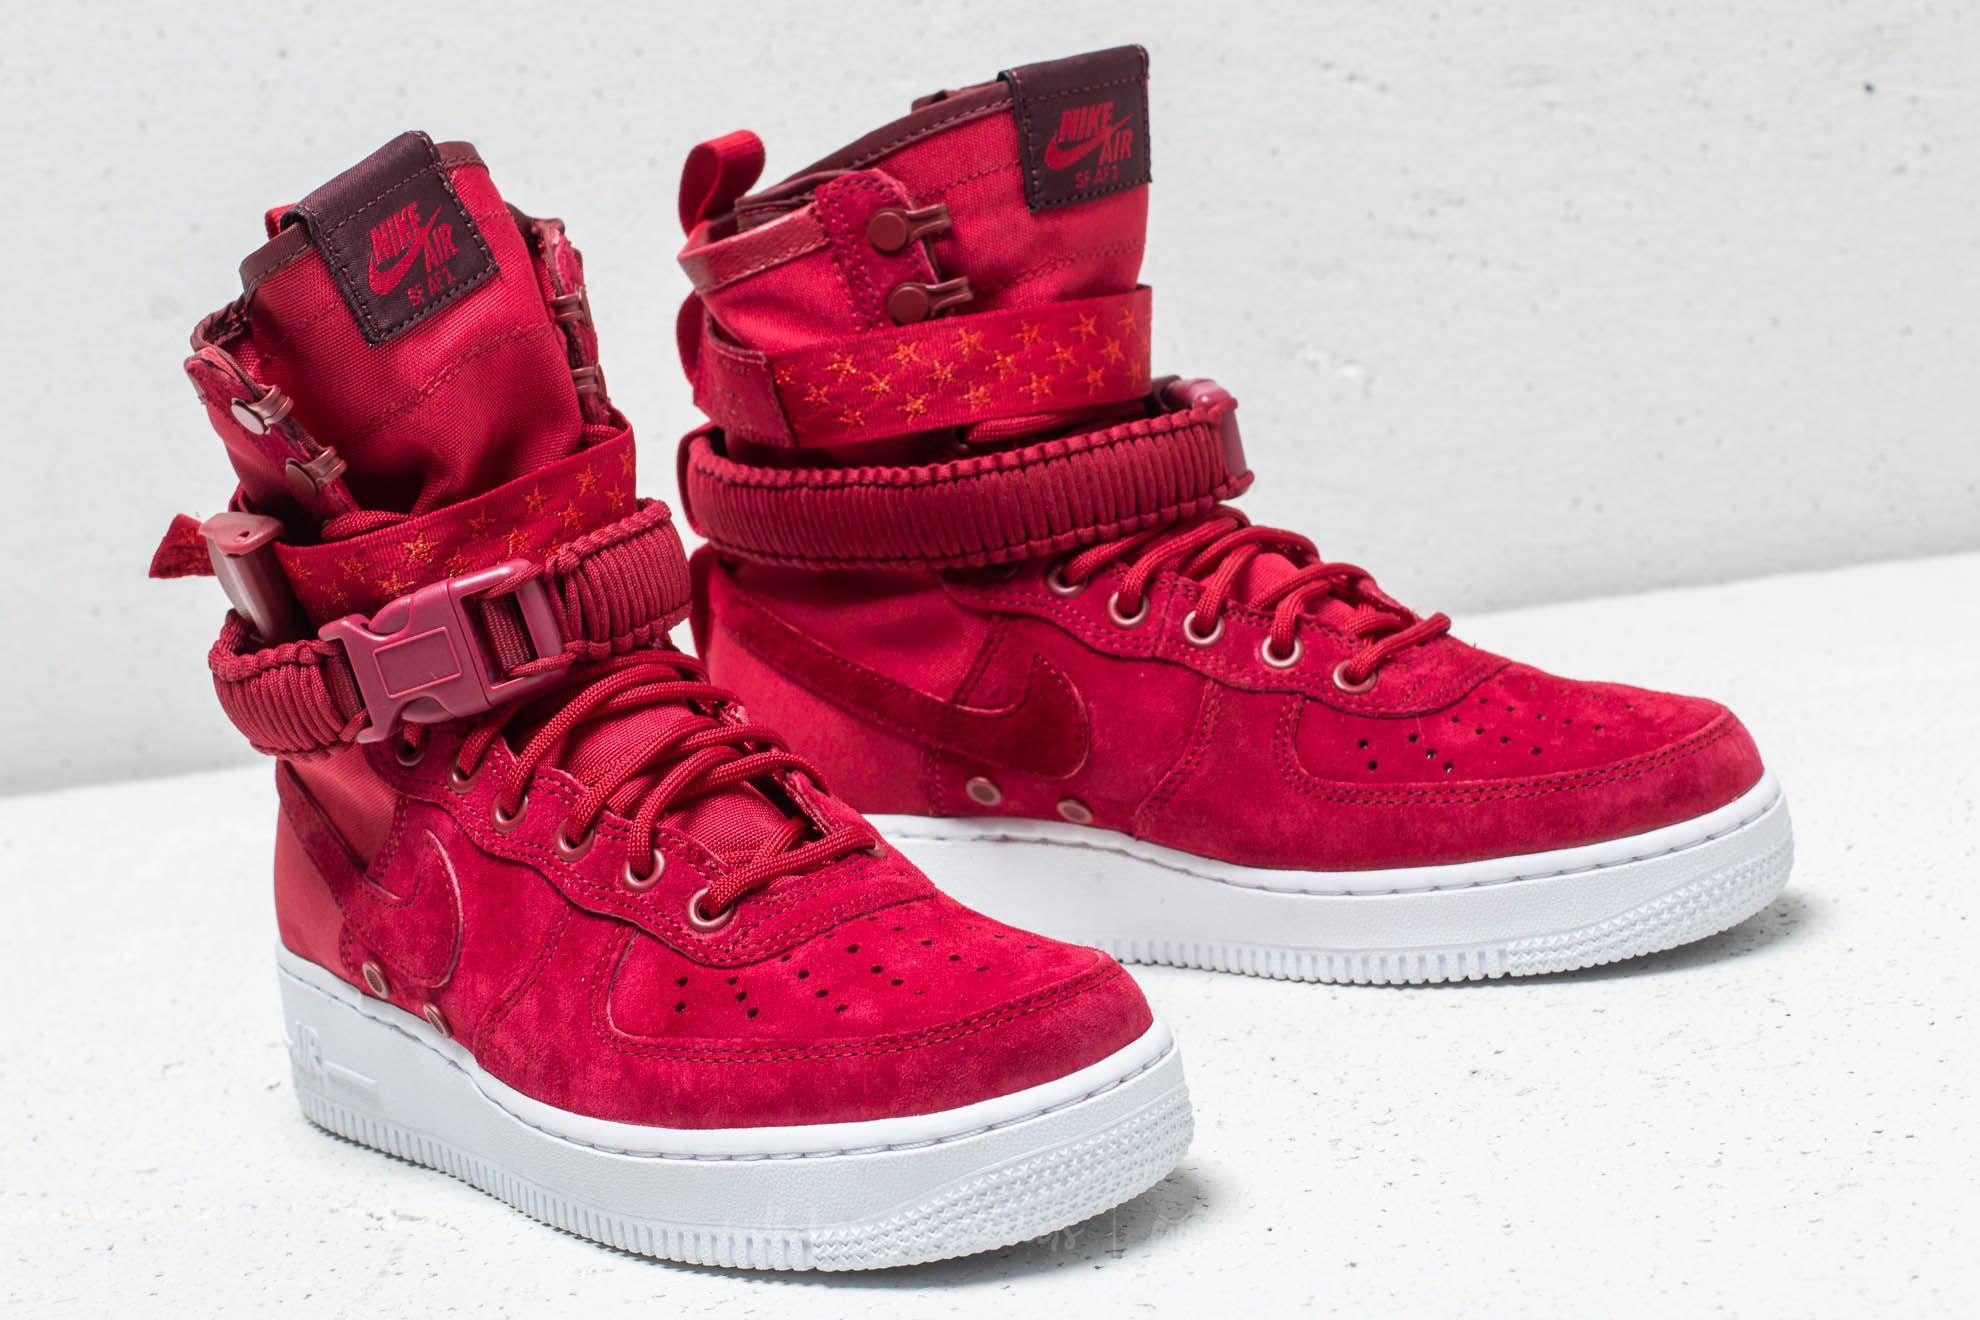 Nike SF Air Force 1 High Red Crush (W) | Air force 1 high